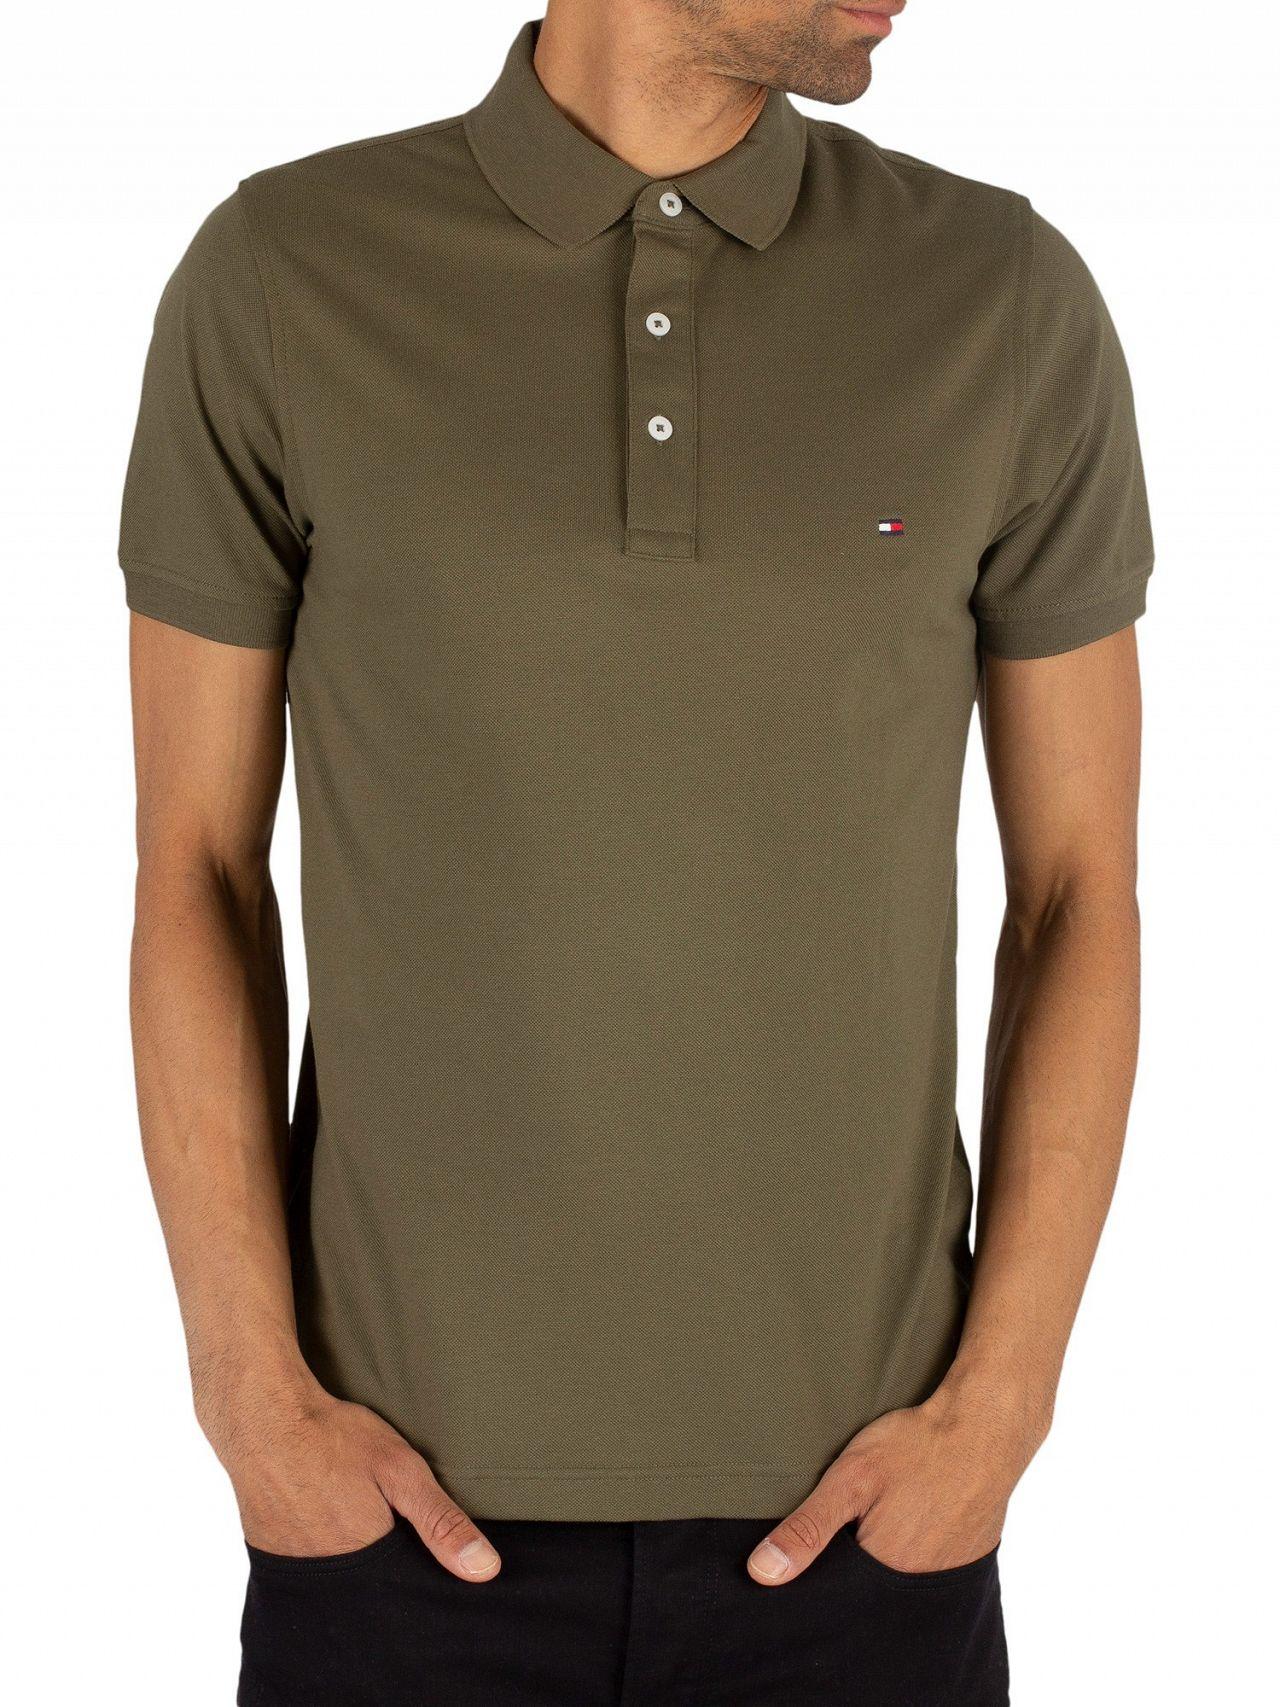 18df34c5 Tommy Hilfiger Grape Leaf Slim Fit Poloshirt | Standout